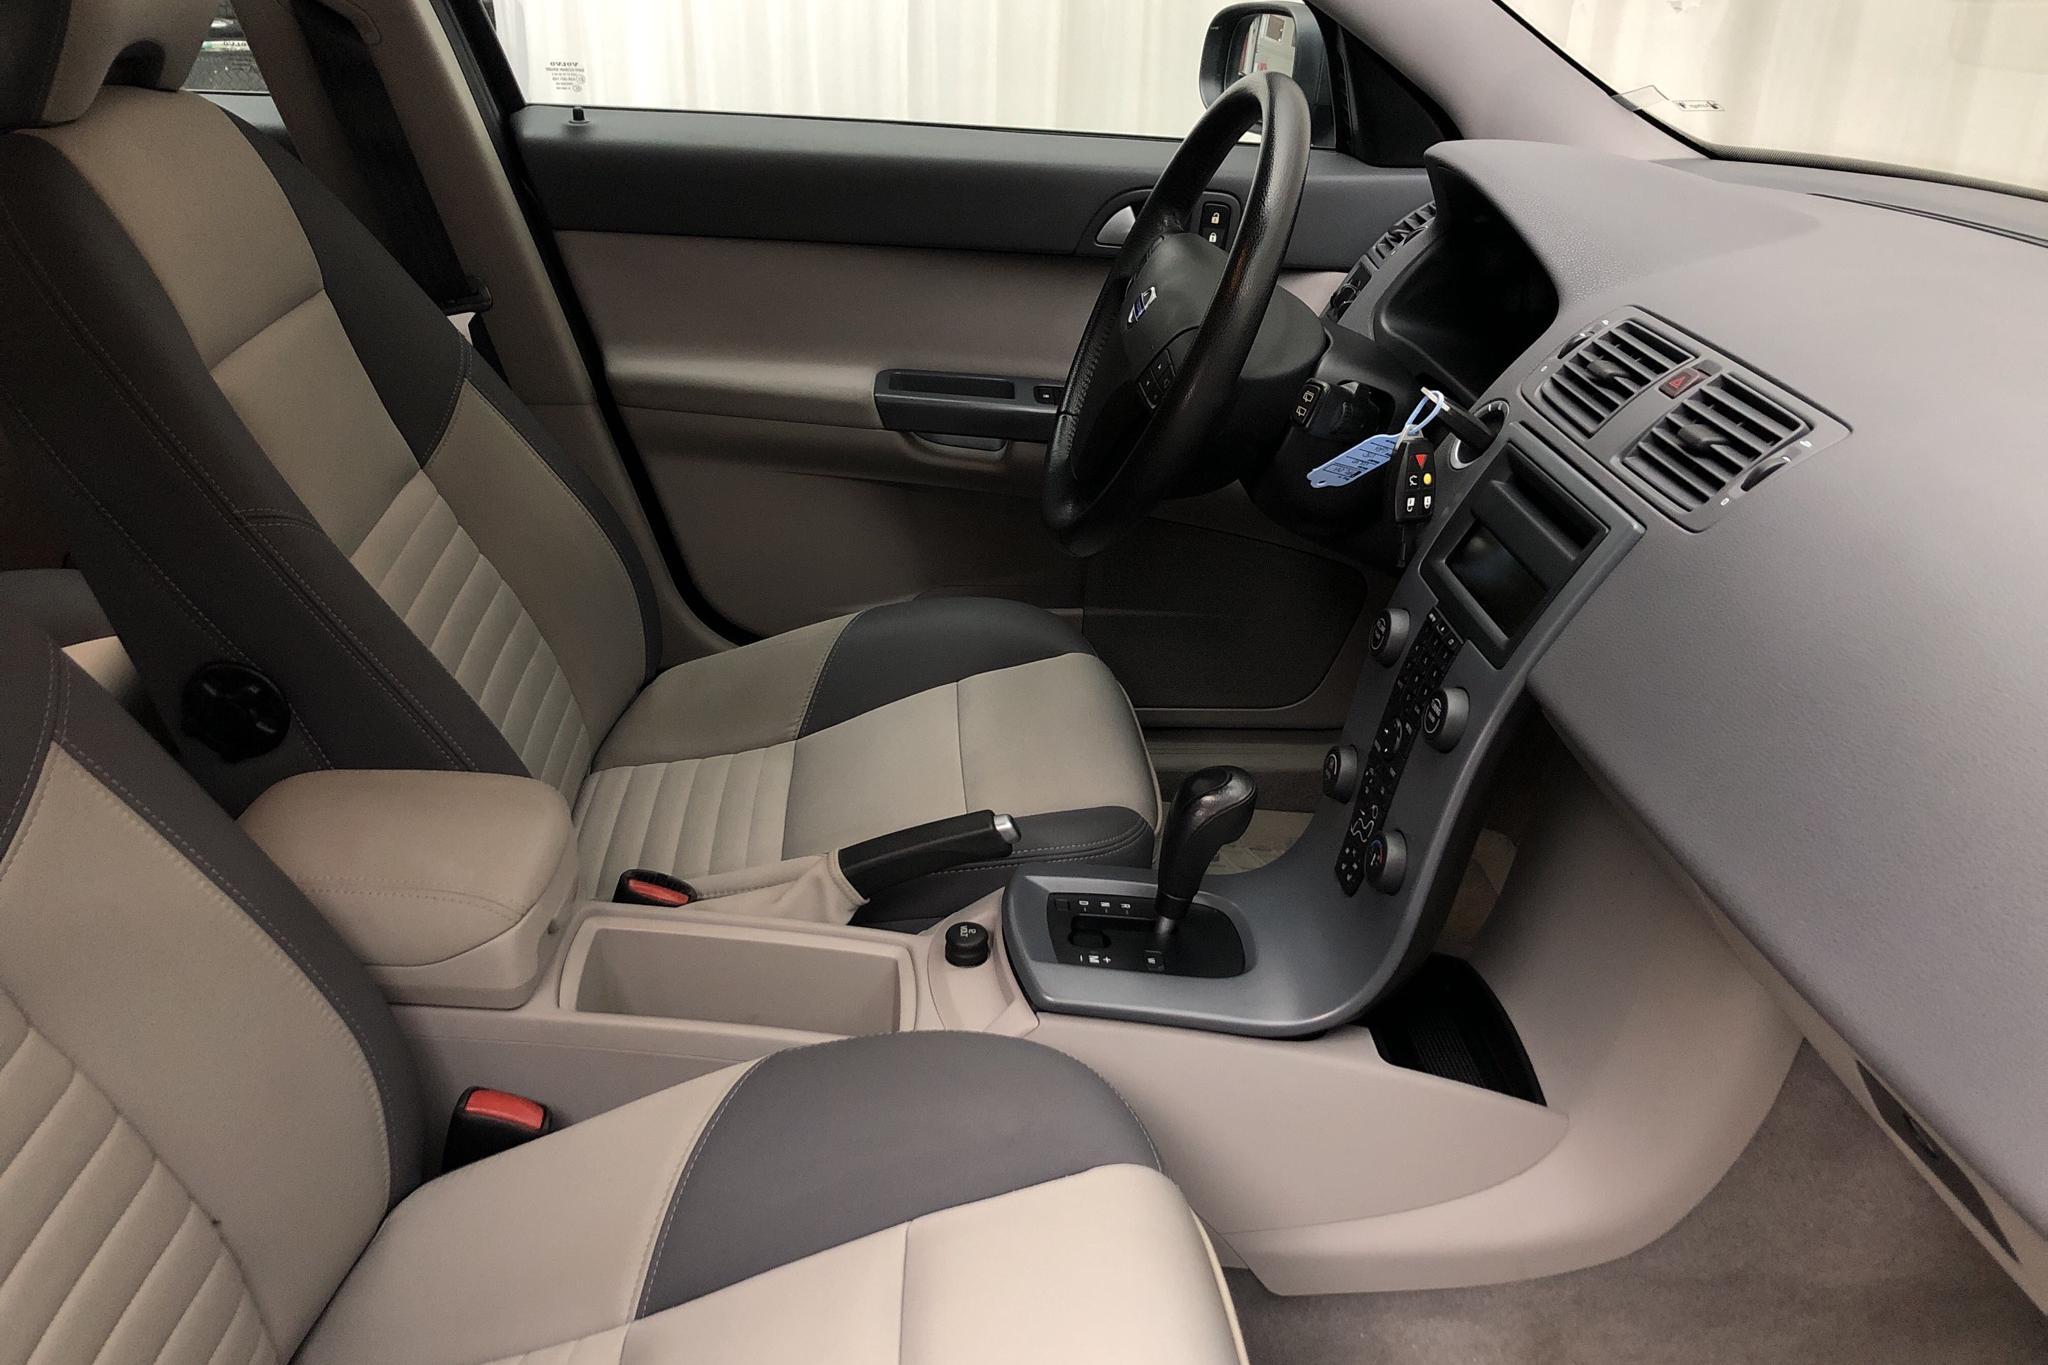 Volvo V50 2.4i (170hk) - 133 480 km - Automatic - gray - 2007